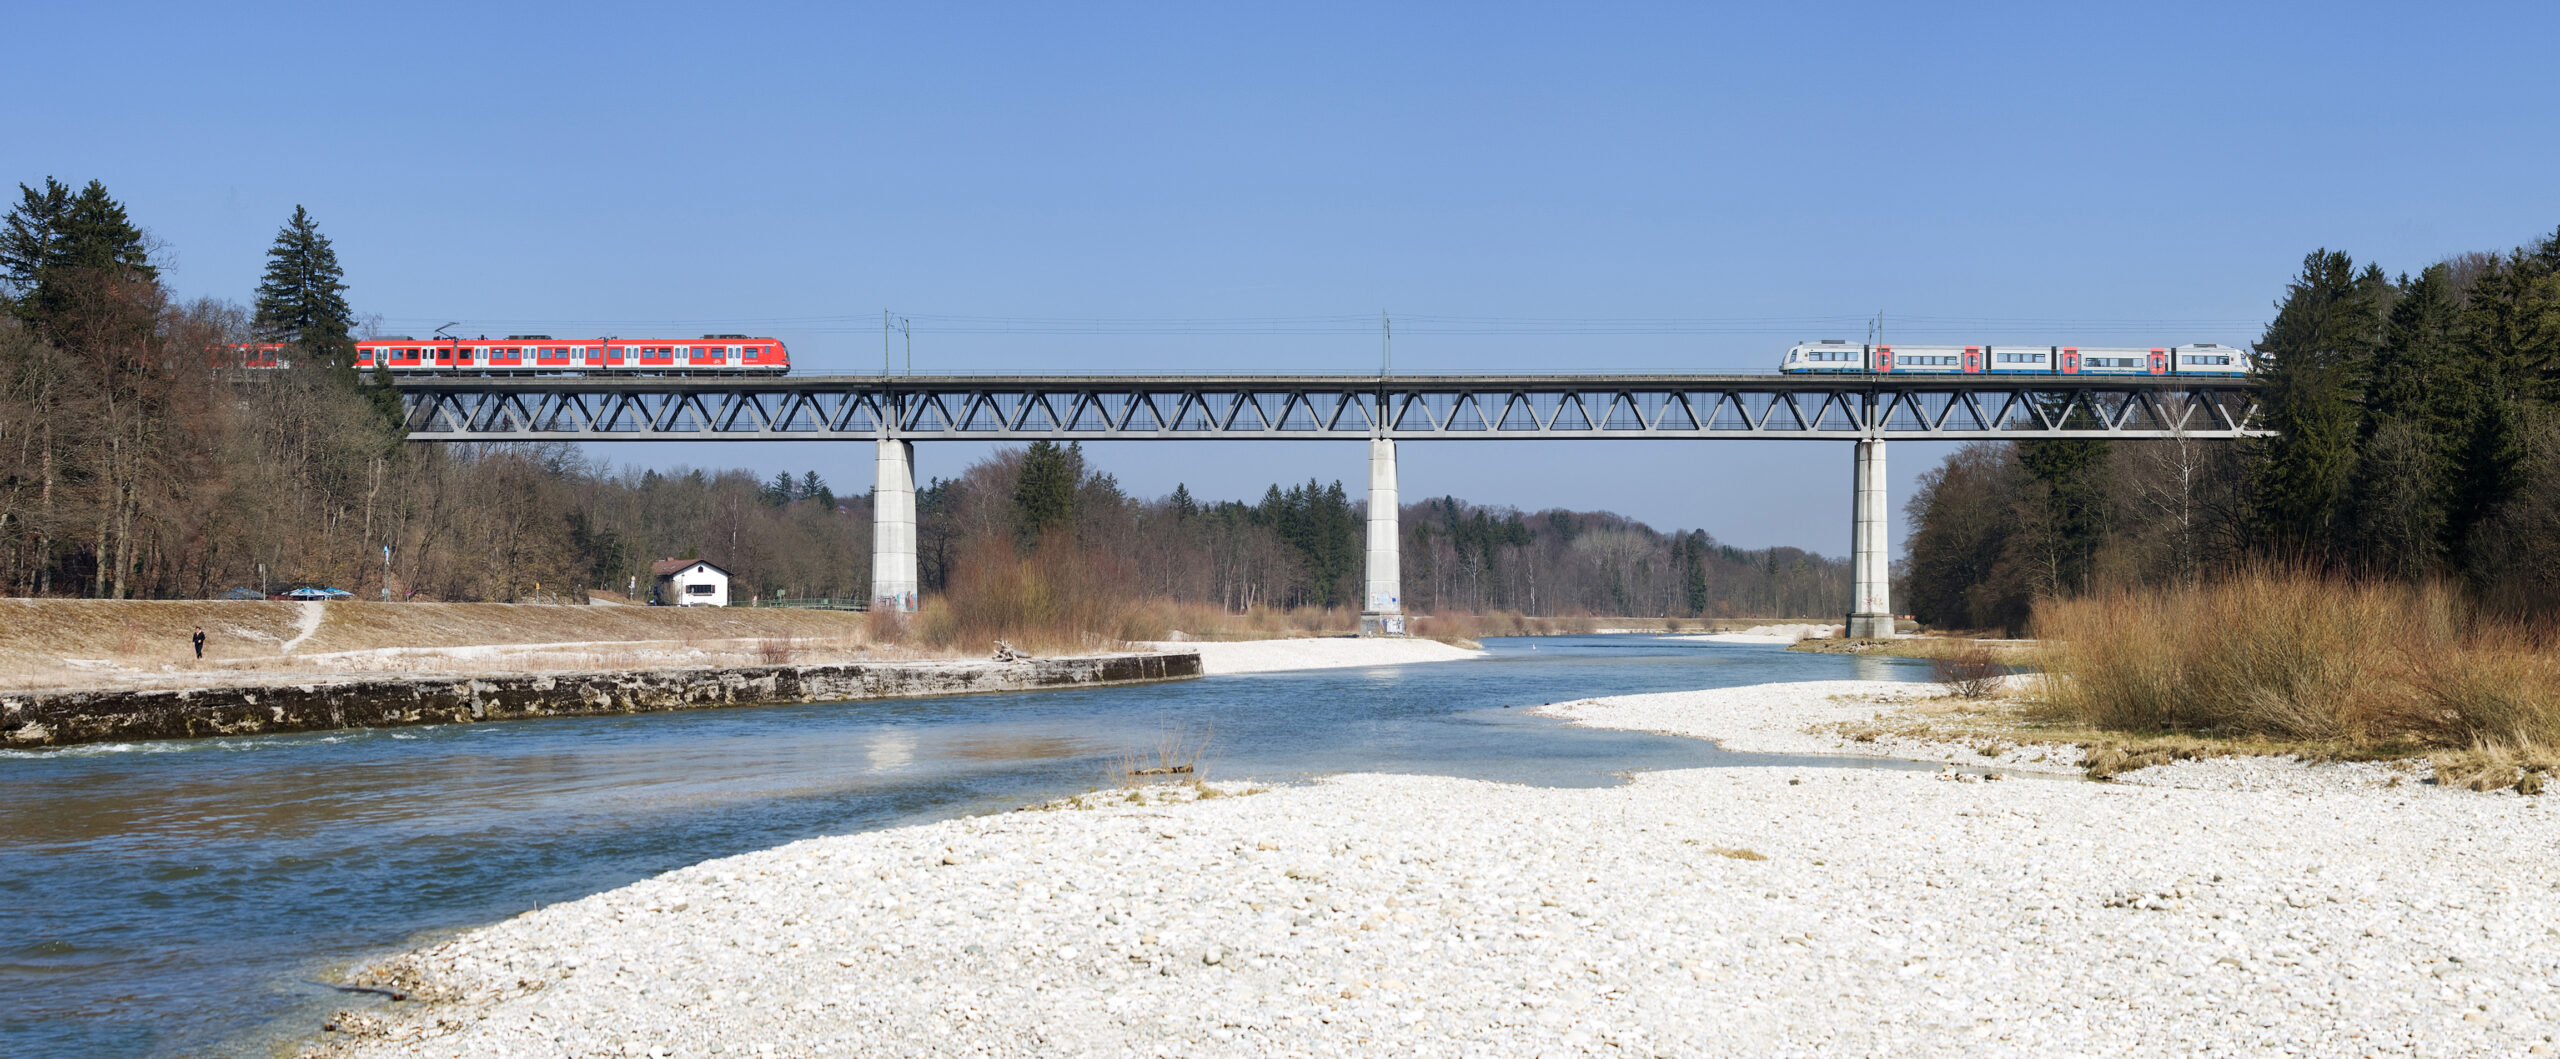 Bahnverkehrsknoten München [Standpunkte 02./03.2018]